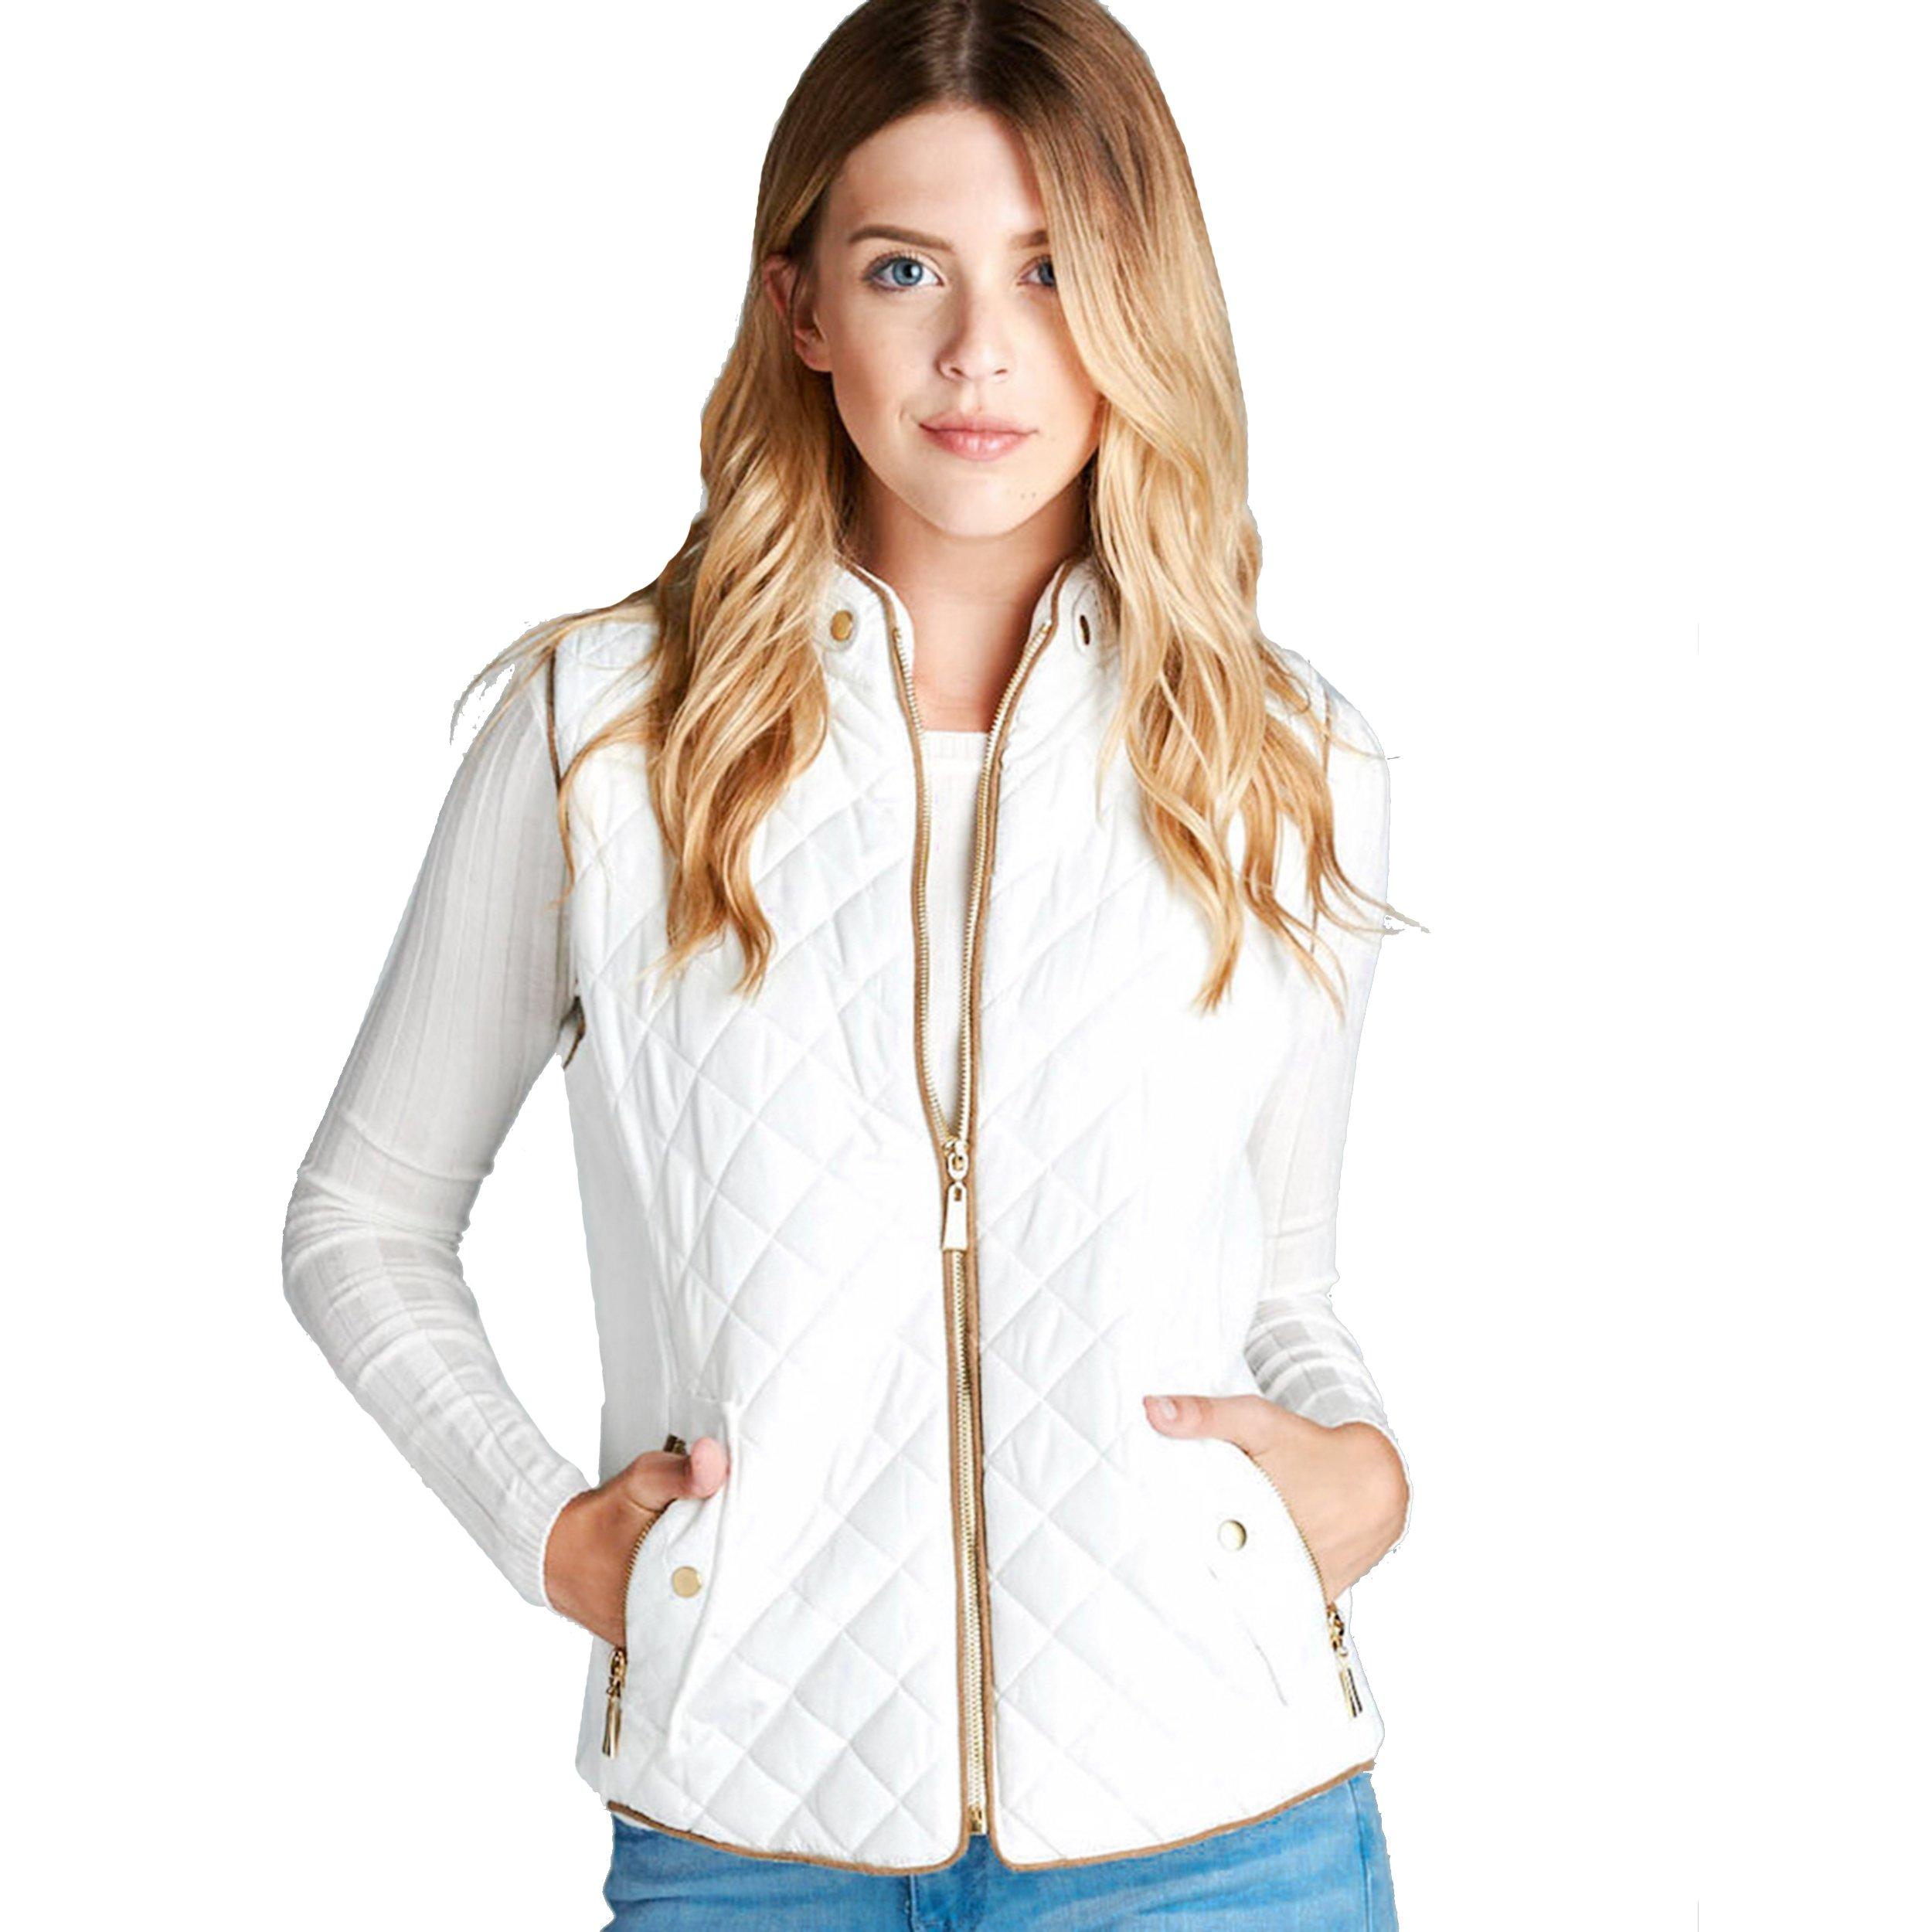 Trends SNJ Women's Lightweight Quilted Padding Zip Up Jacket Vest